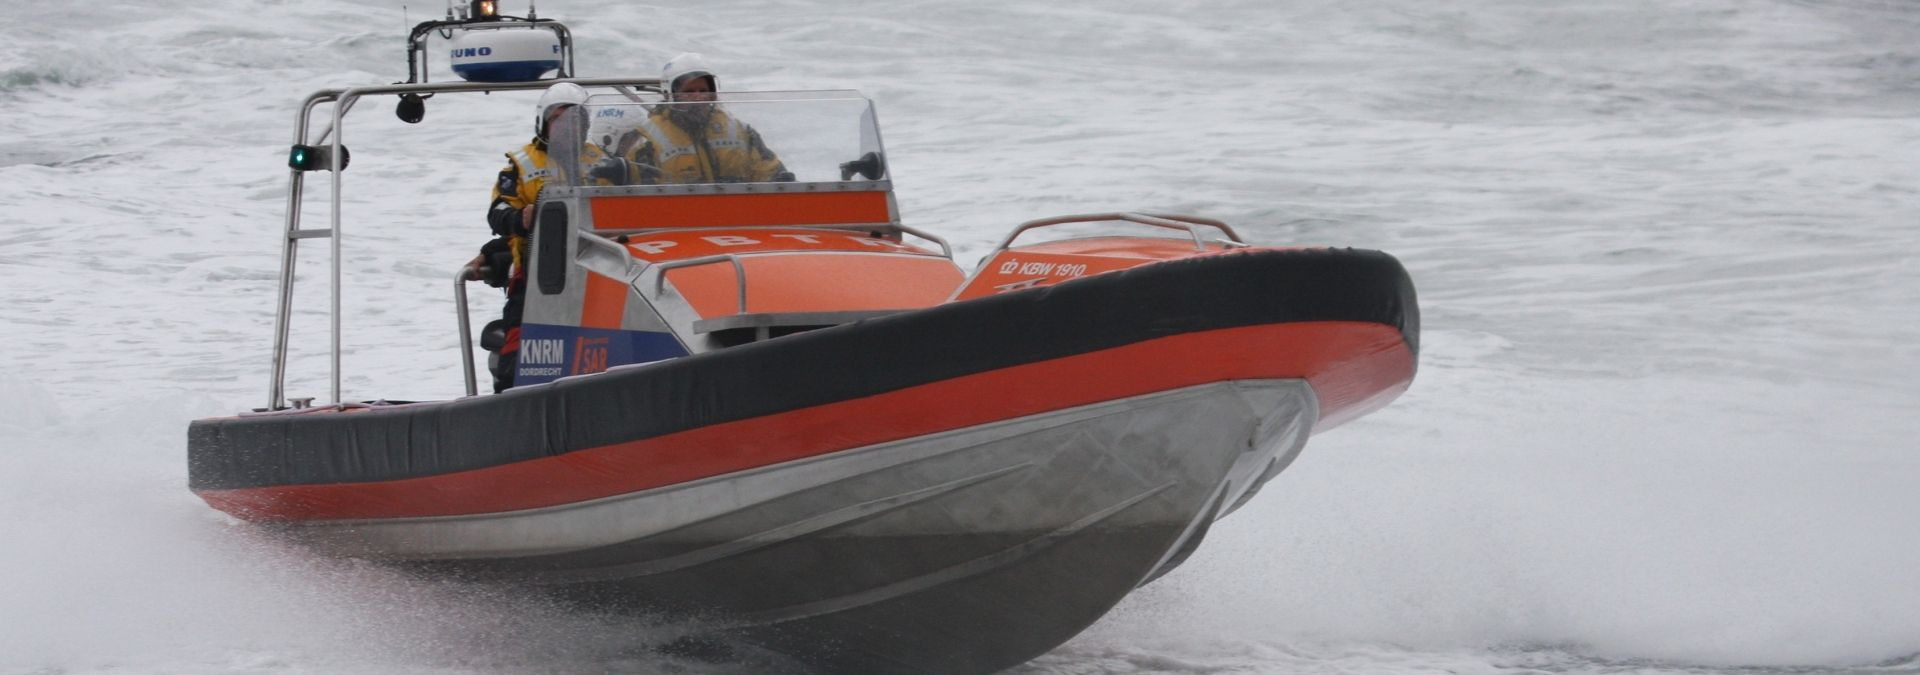 Reddingboot KBW 1910